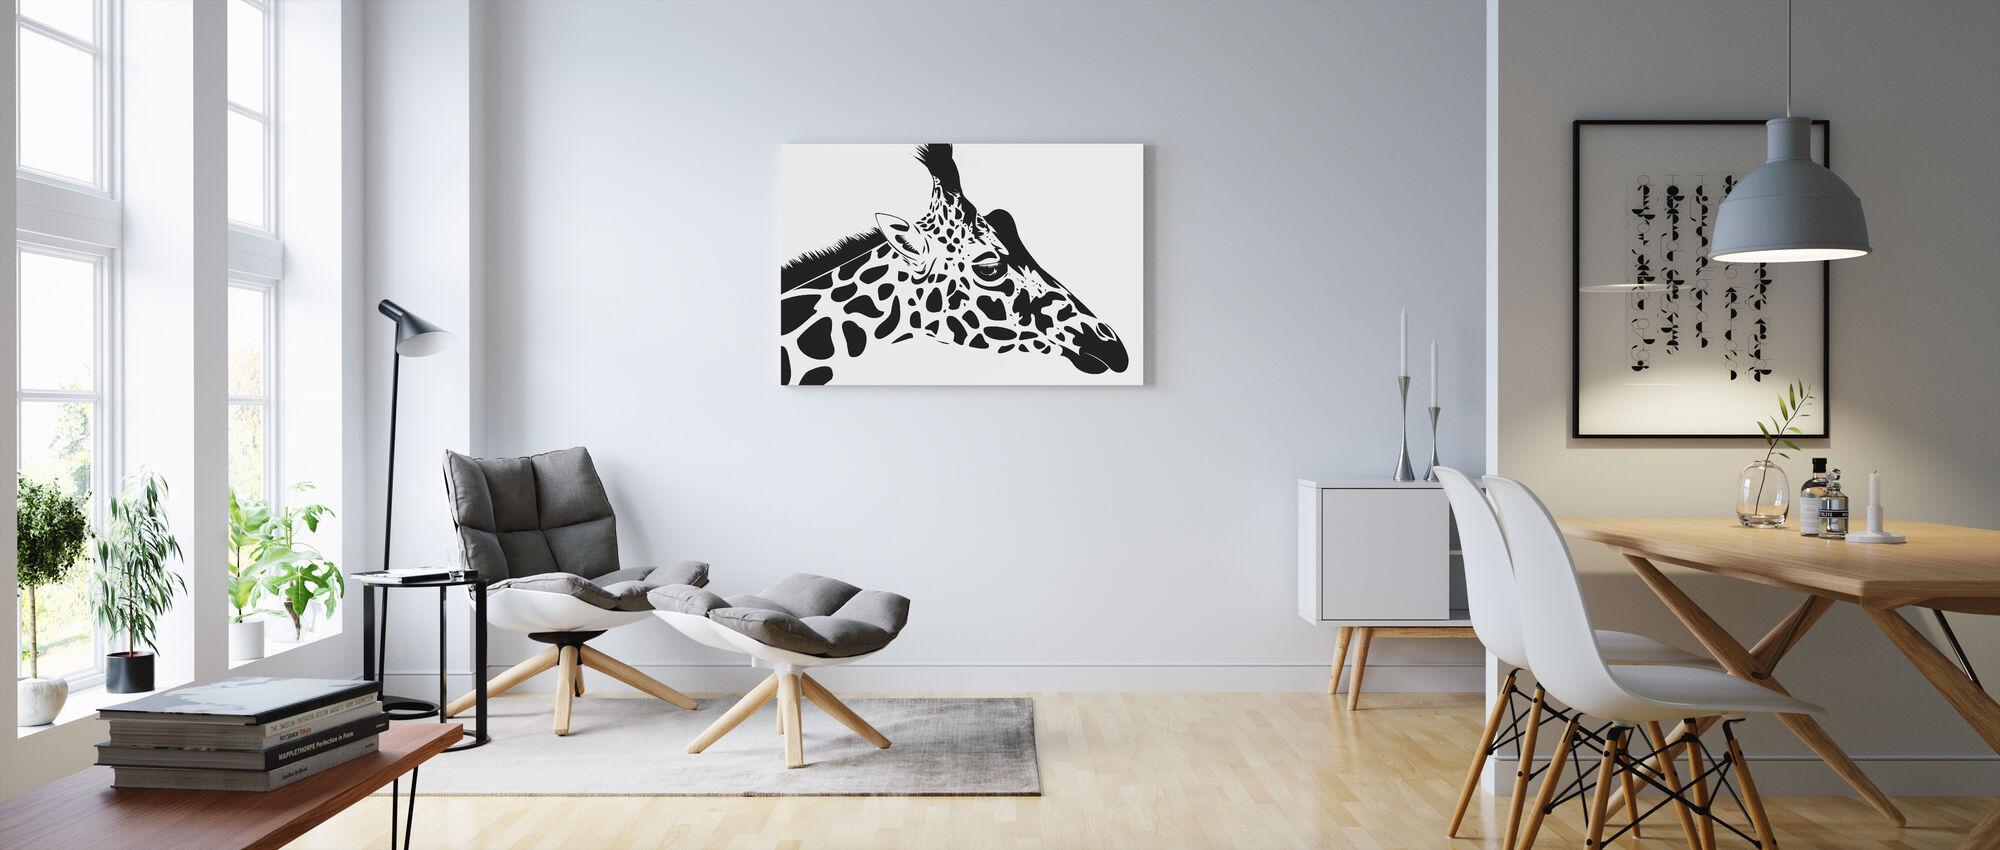 Giraffe - Canvas print - Living Room